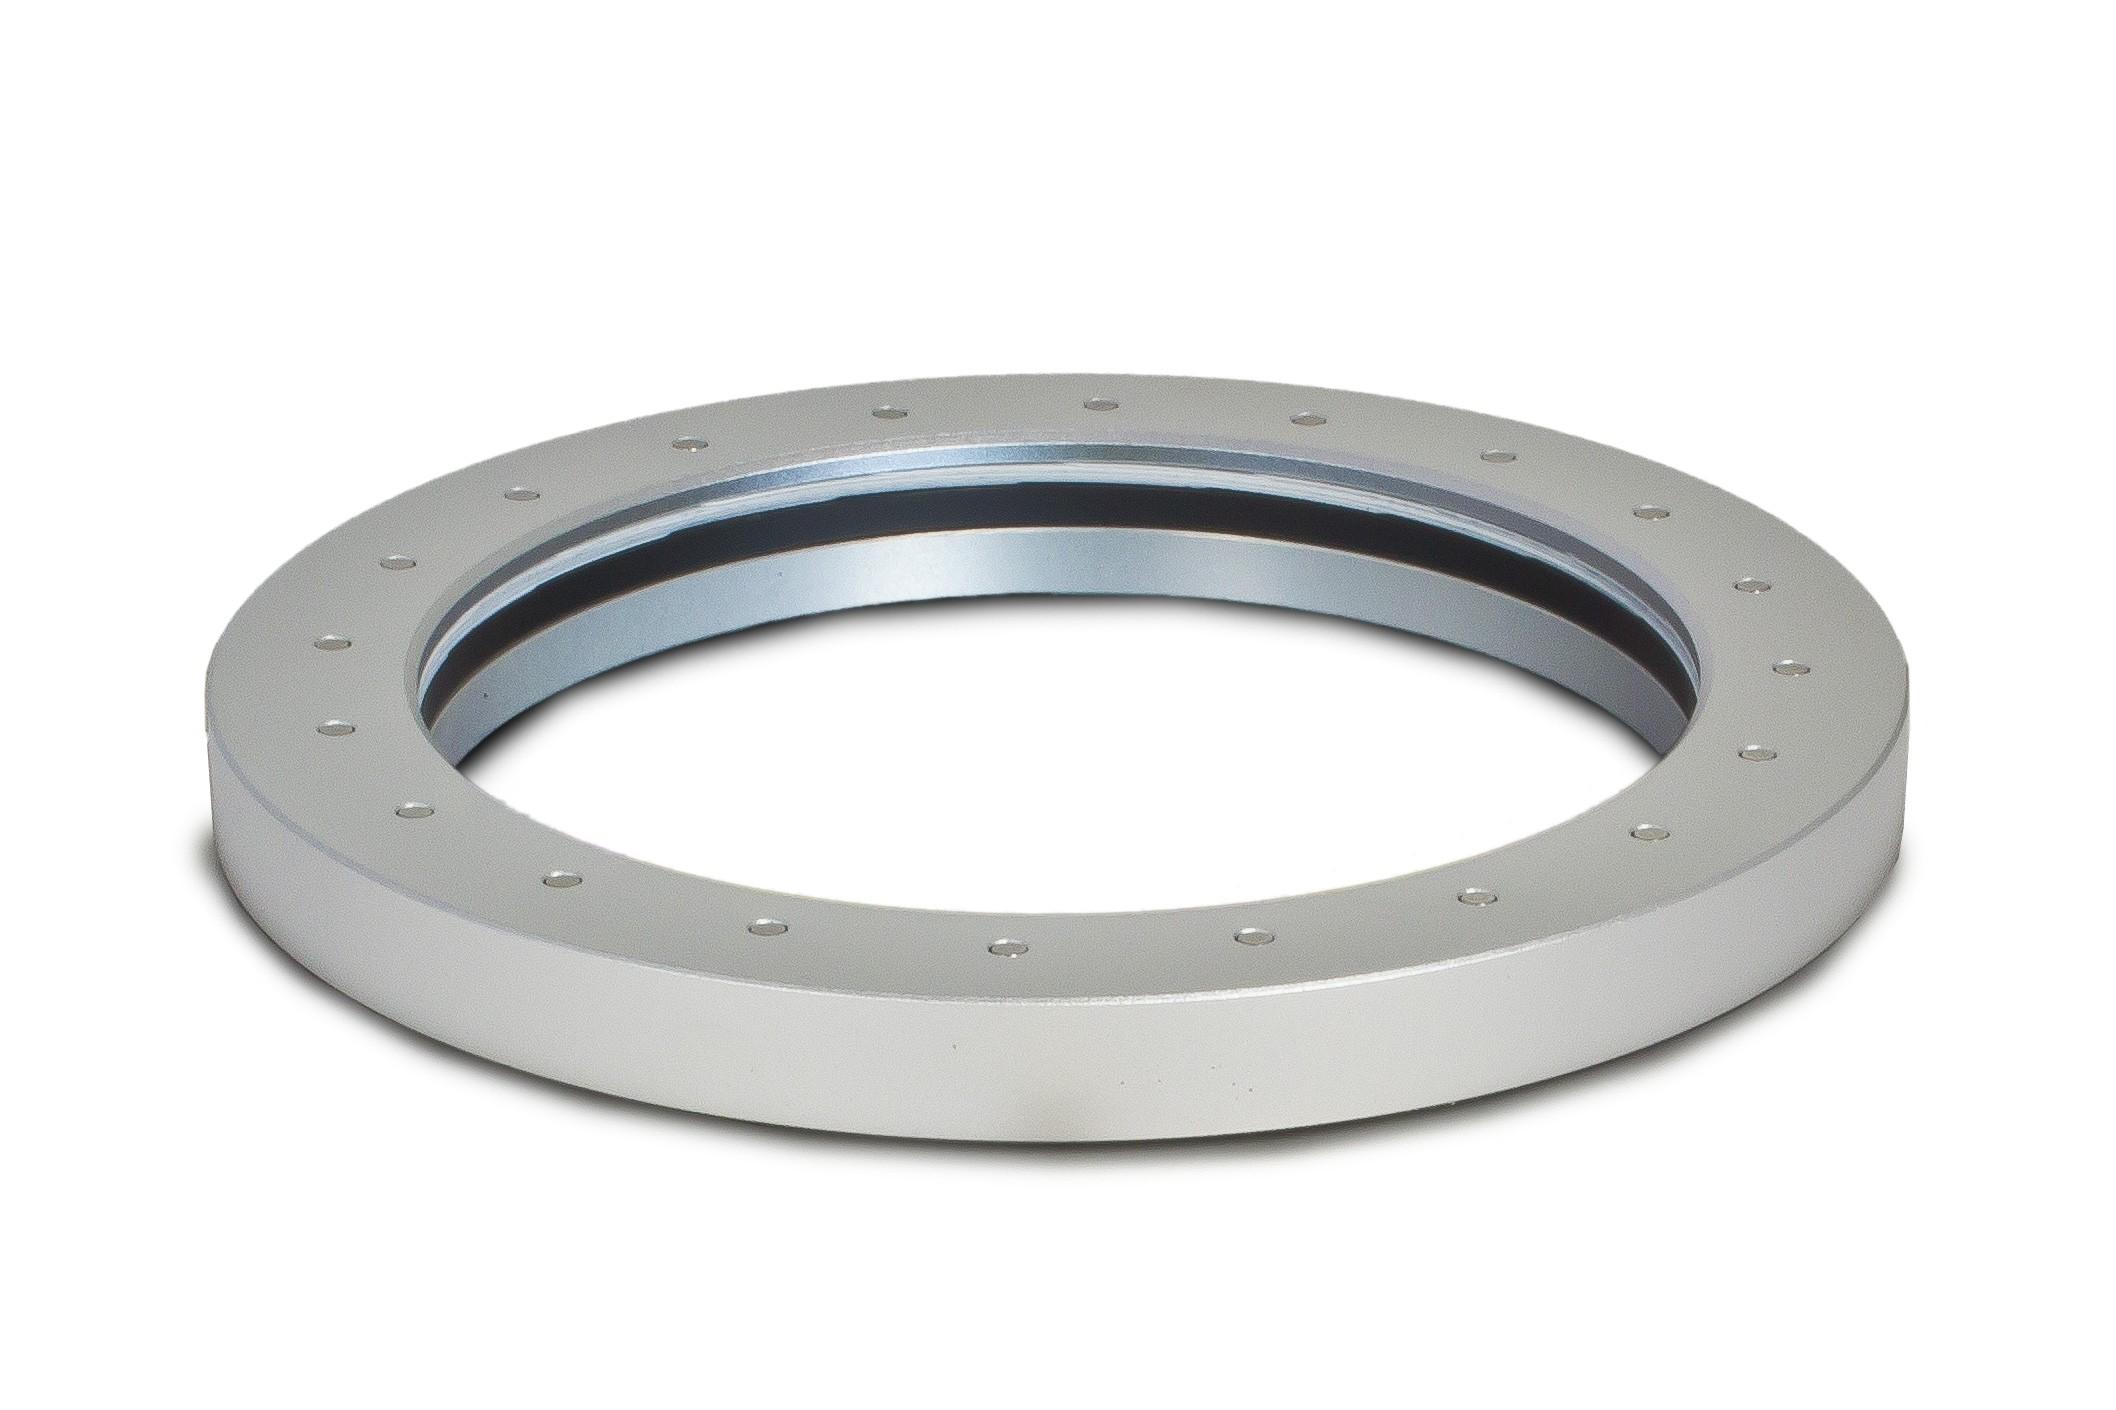 Steplessly variable diaphragm 13 - 113mm